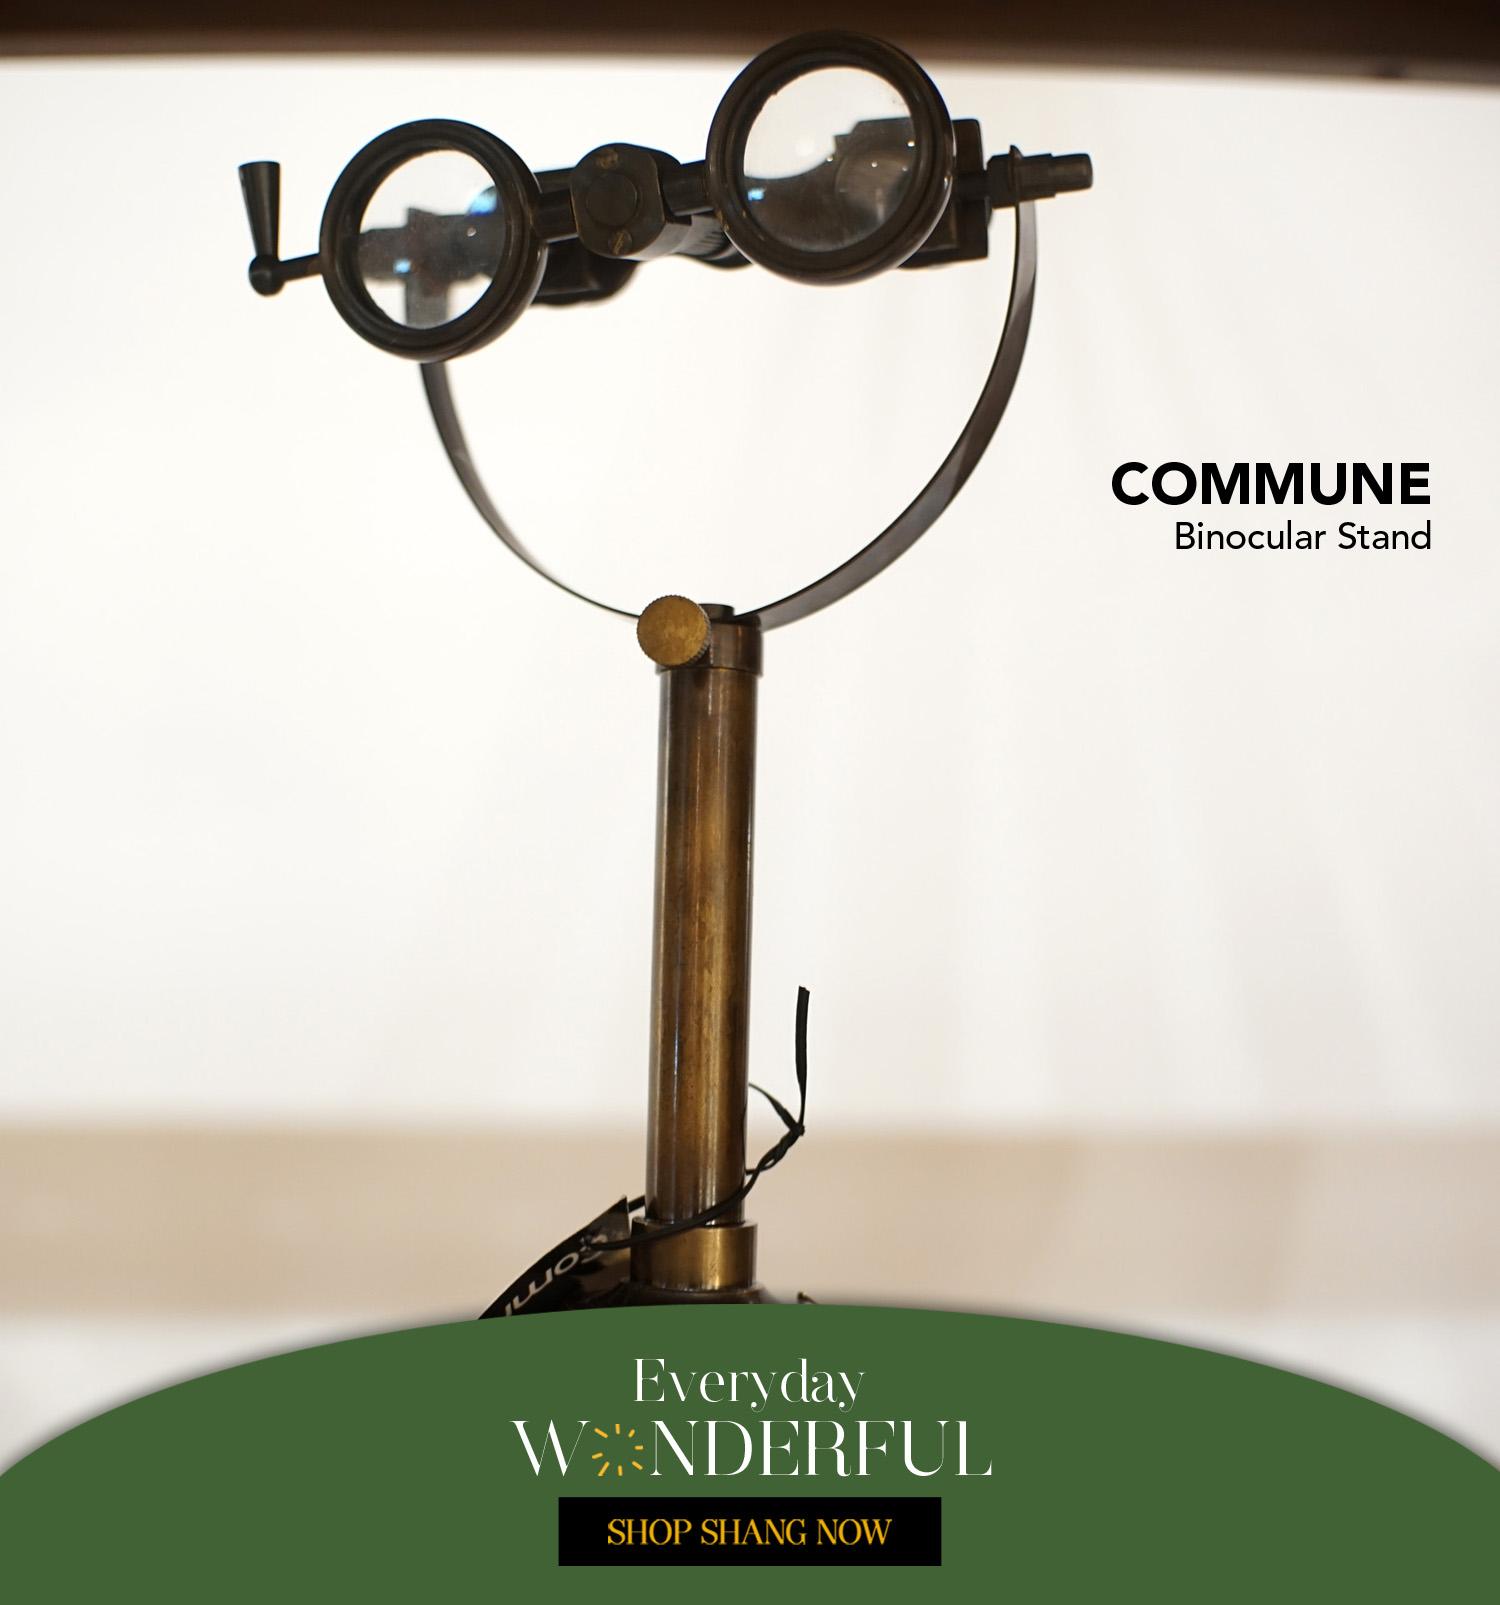 Binocular Stand from Commune